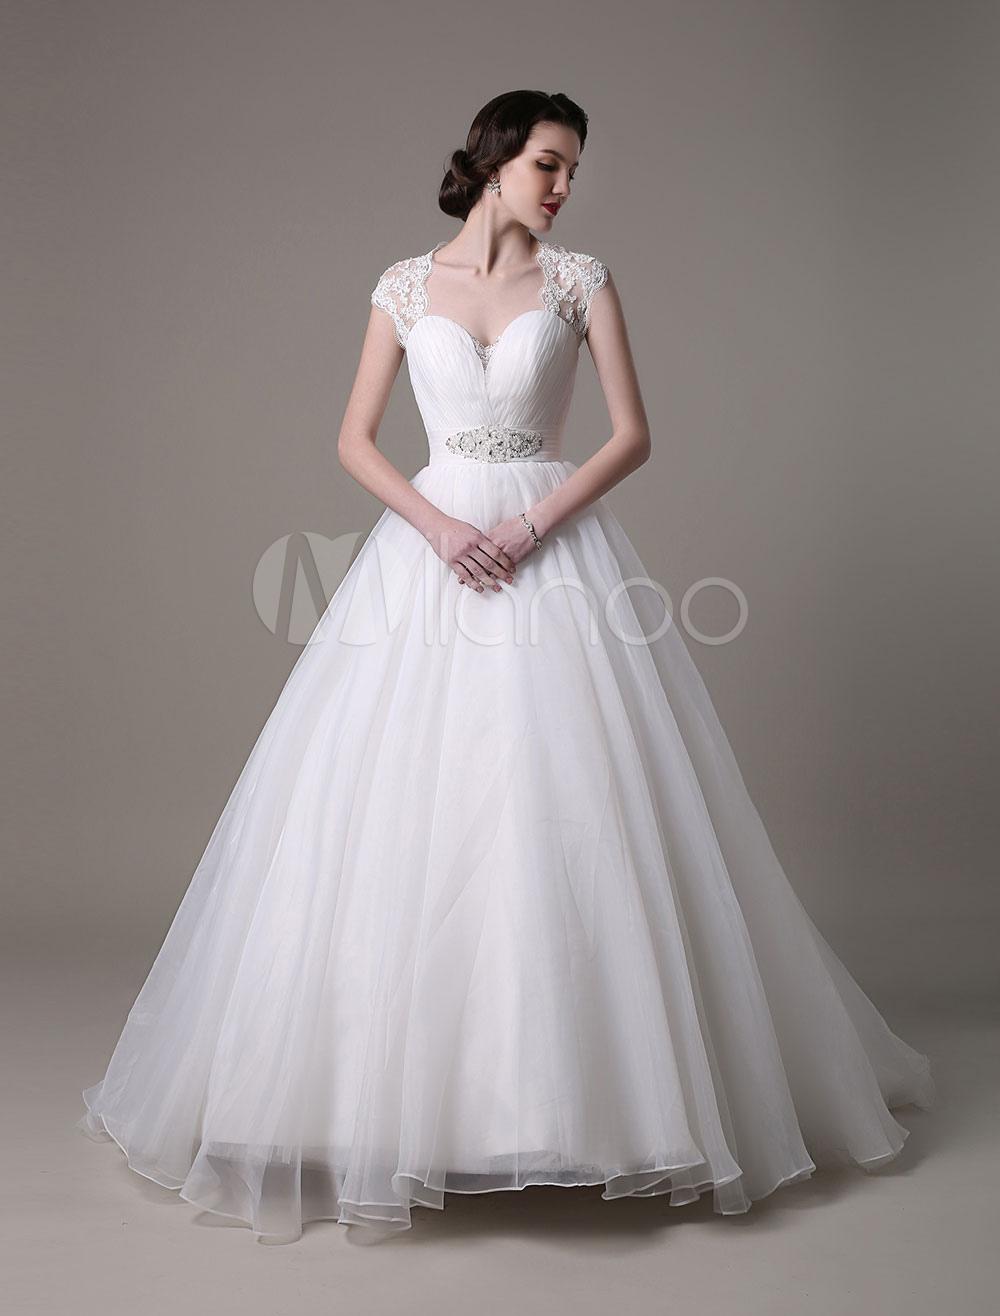 2018 Wedding Dresses Queen Anne Neckline Bridal Gown Organza Lace Rhinestones Beading Pleated Sash Train Bridal Dress Milanoo